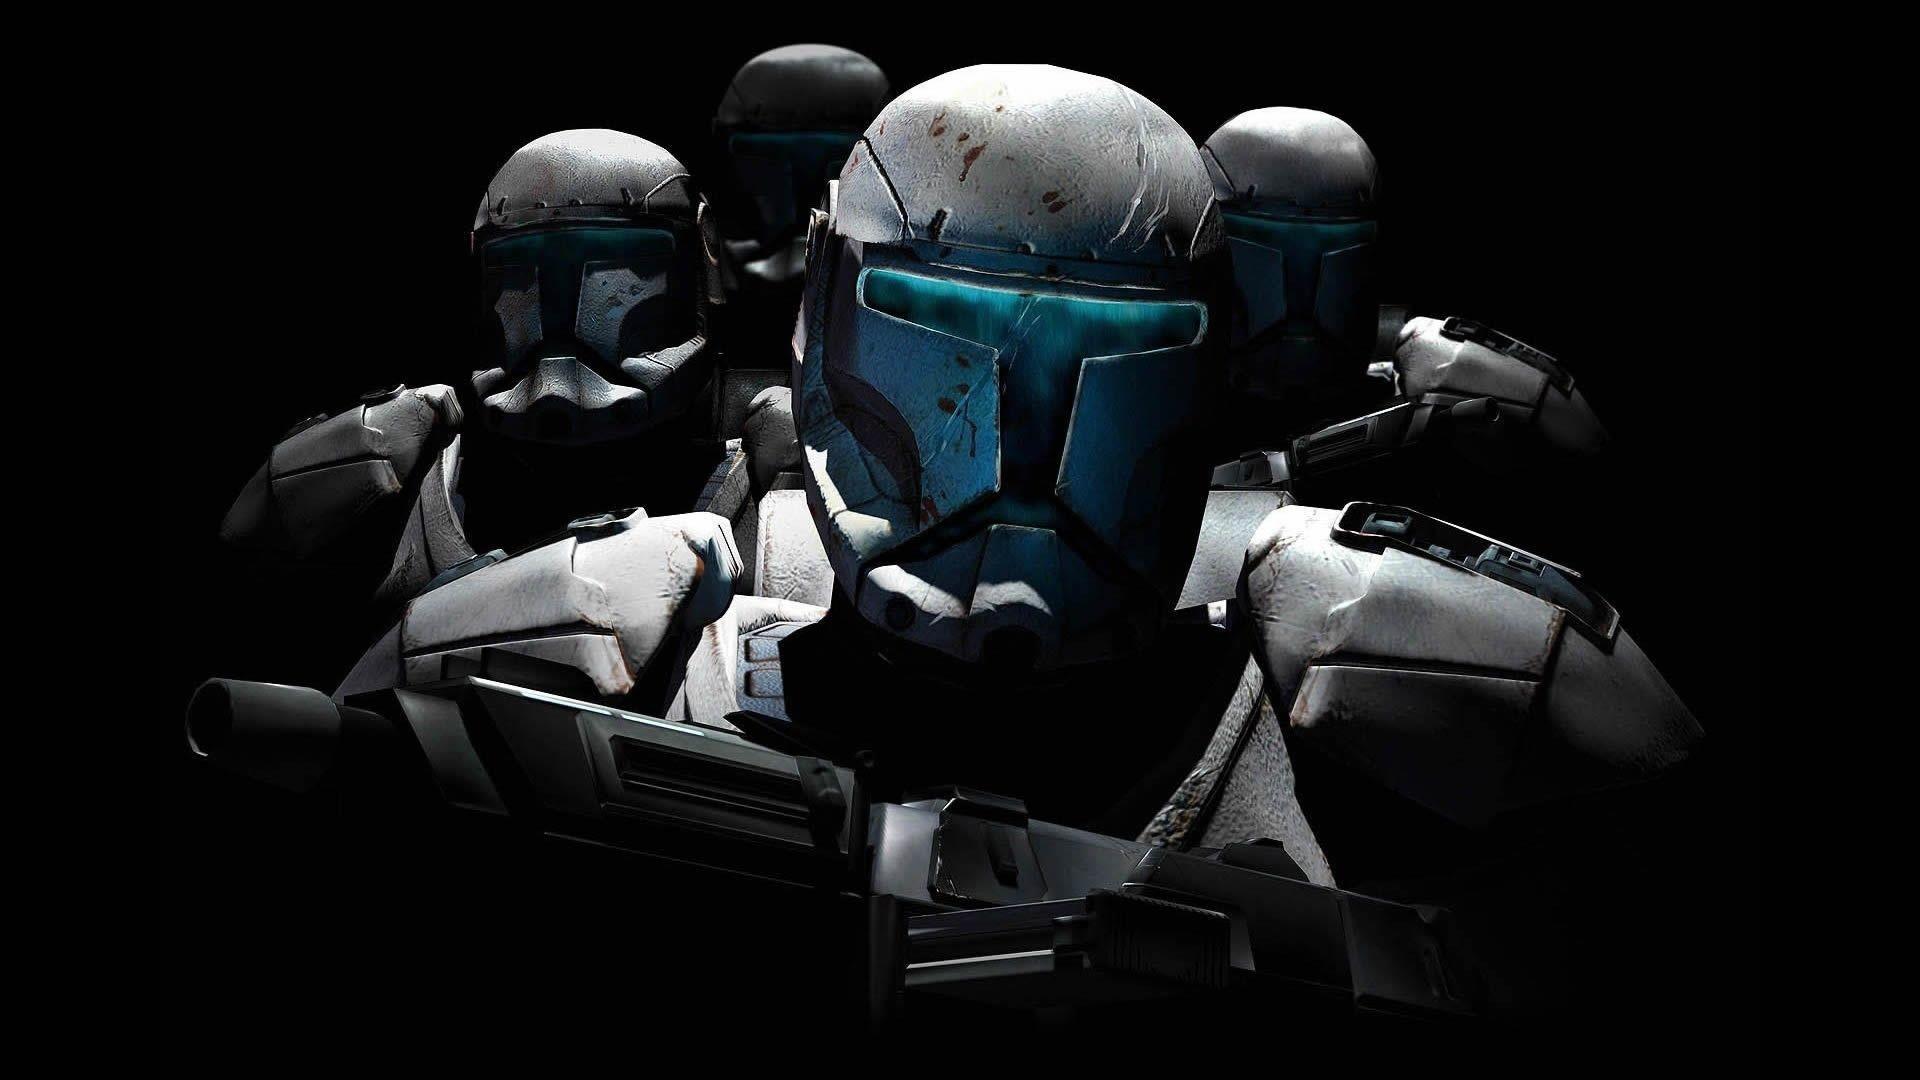 Beautiful Star Wars Photos in Full HD